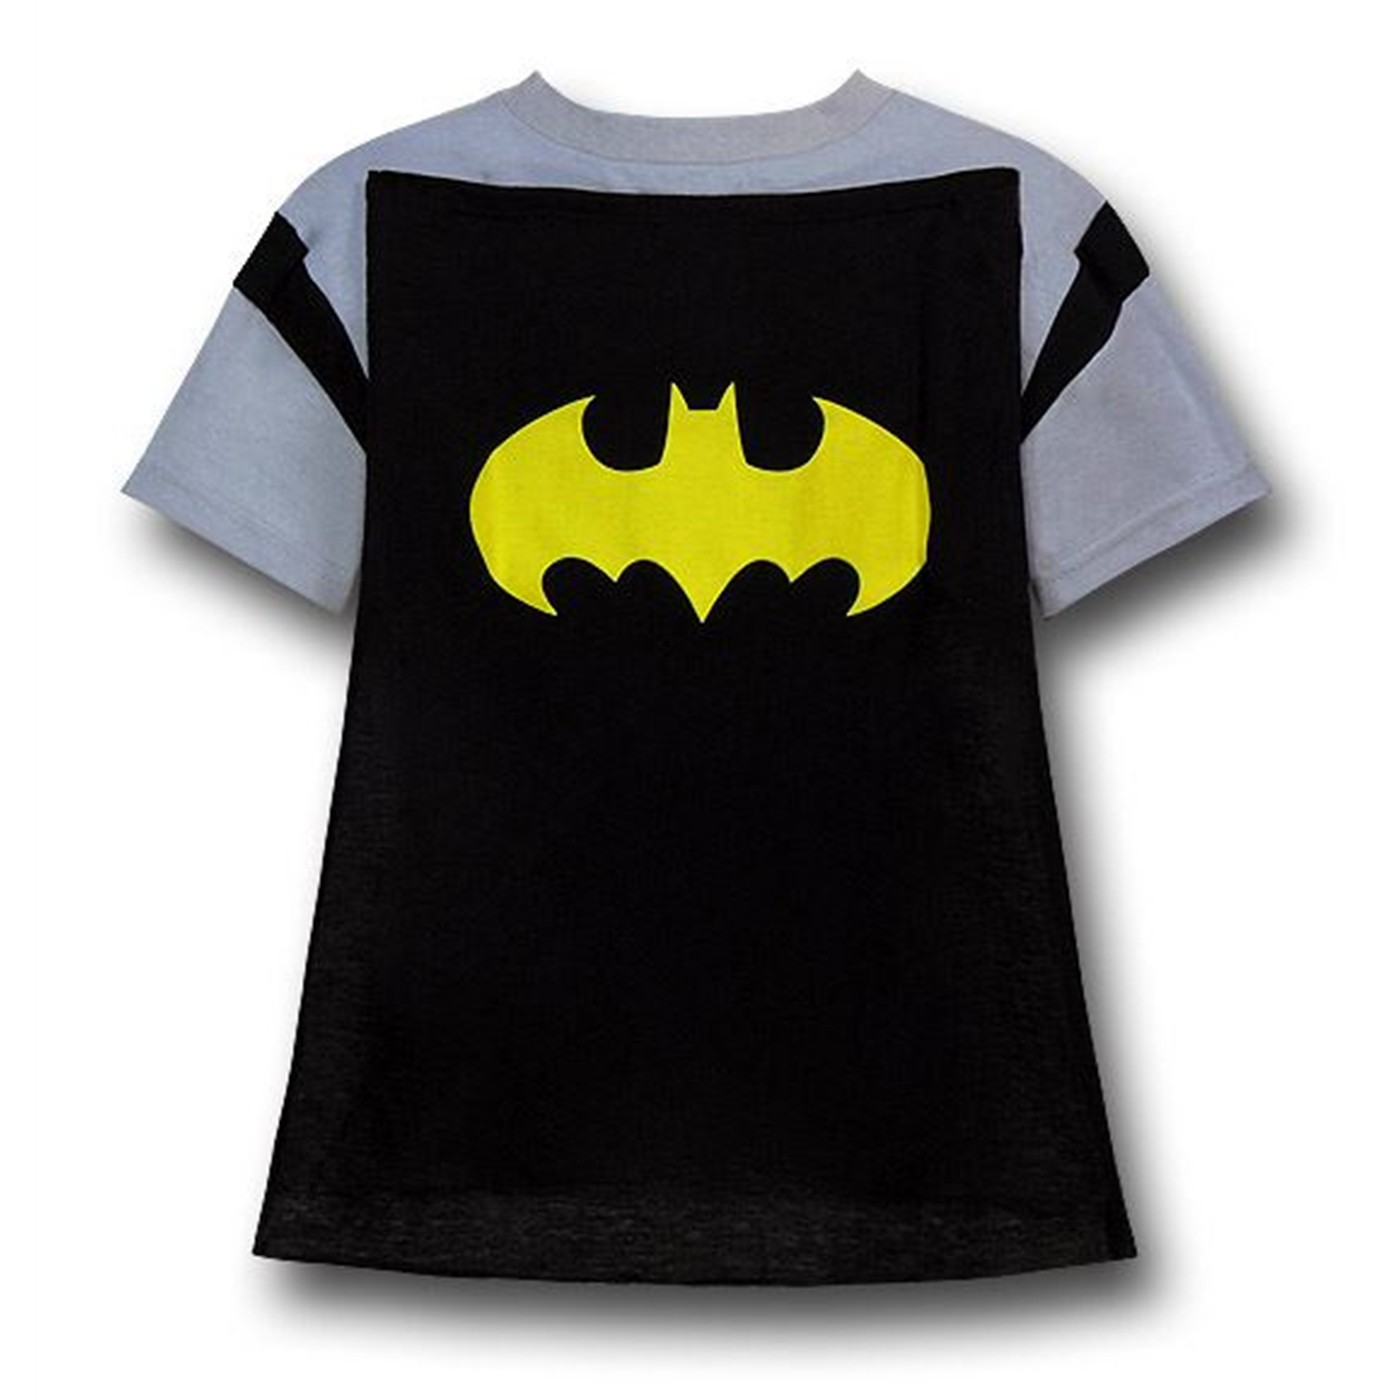 Batman Kids Grey Caped Costume T-Shirt